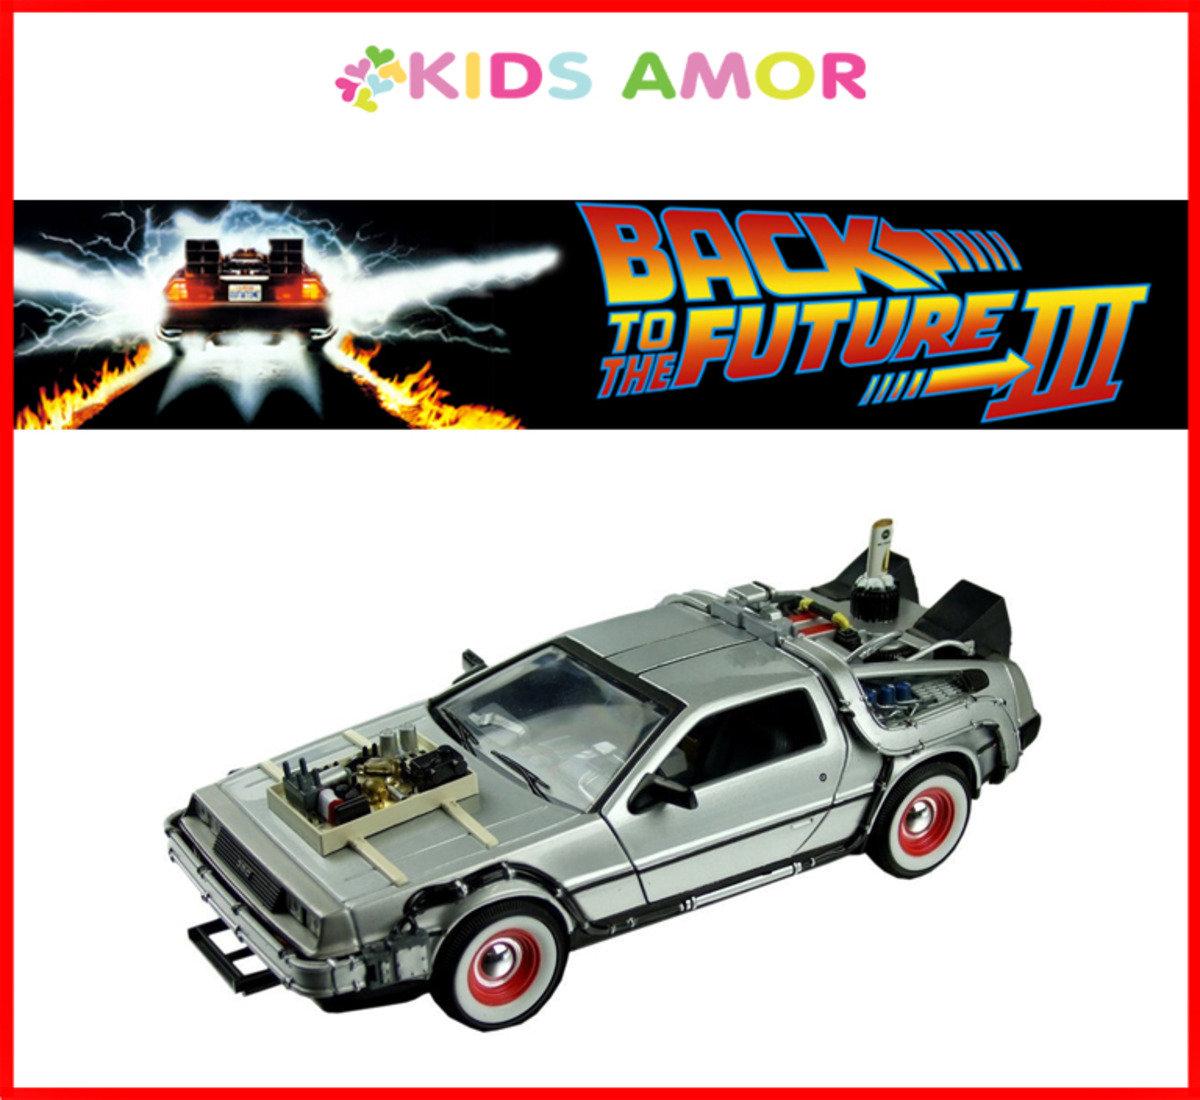 回到未來 III: 1/24 Delorean 合金模型車